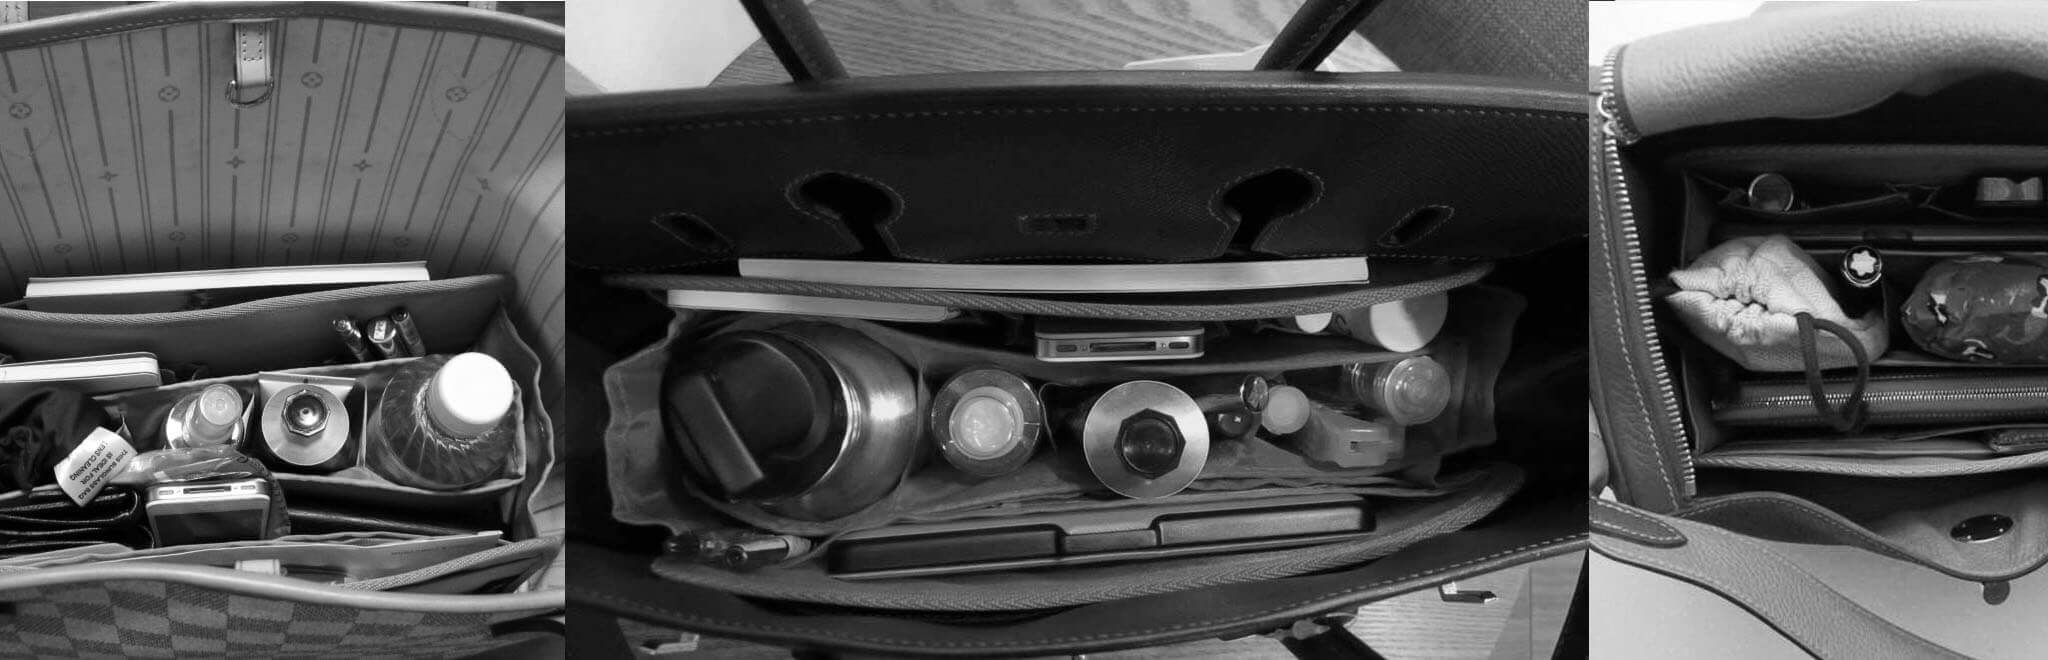 85c5c1b9234 CloverSac   Purse Organizer Insert, Base Shaper, Bag Organiser